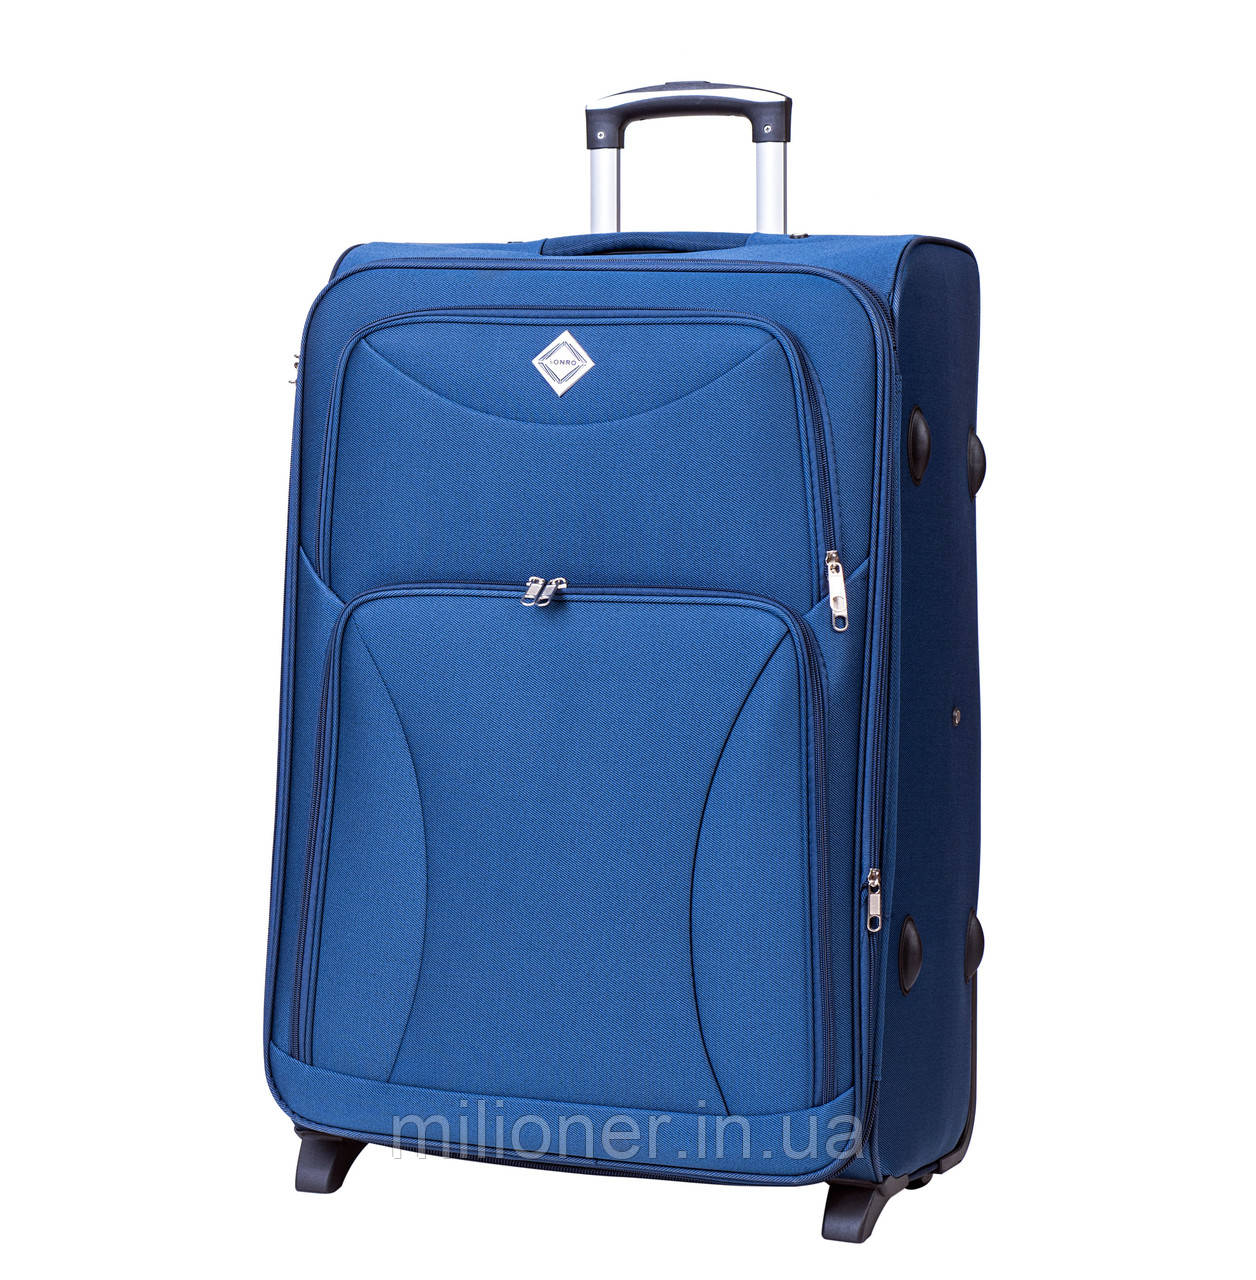 Чемодан Bonro Tourist (небольшой) синий